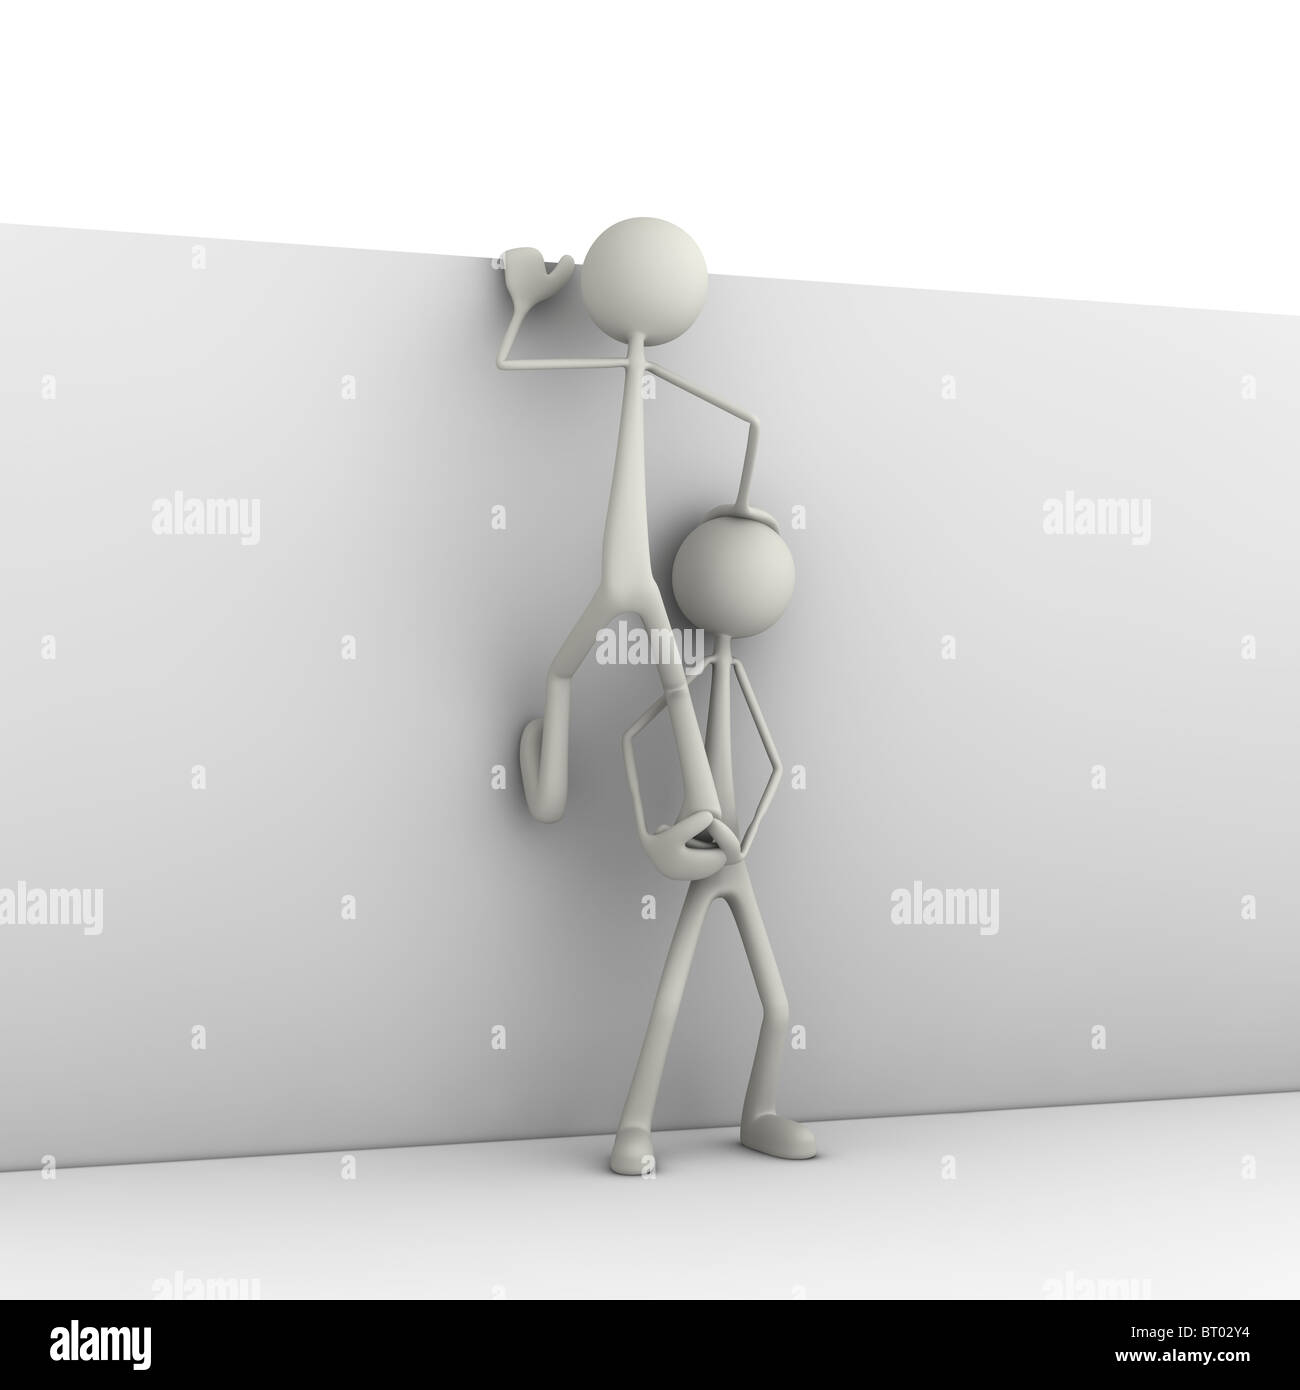 Figures climbing on wall - Stock Image